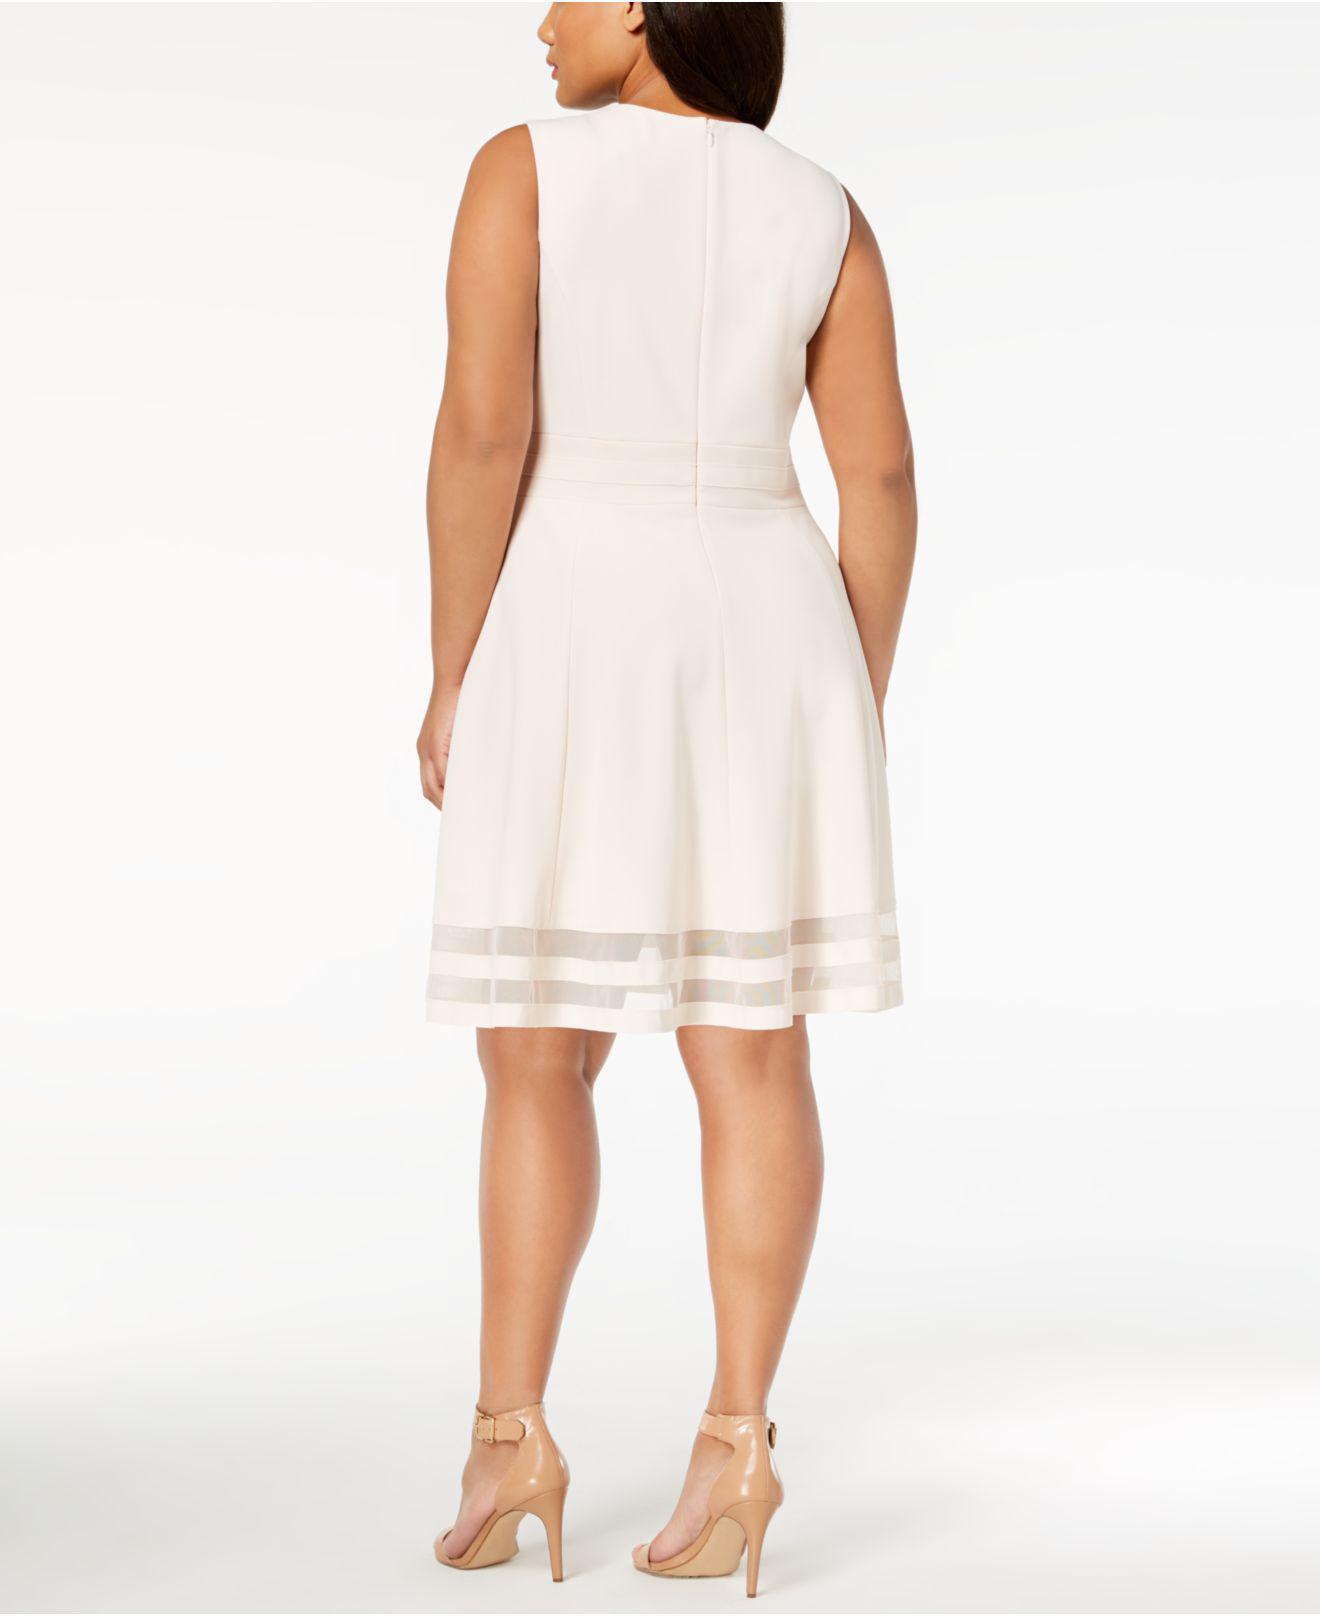 6896df88 Lyst - Calvin Klein Plus Size Illusion-trim Fit & Flare Dress in Natural